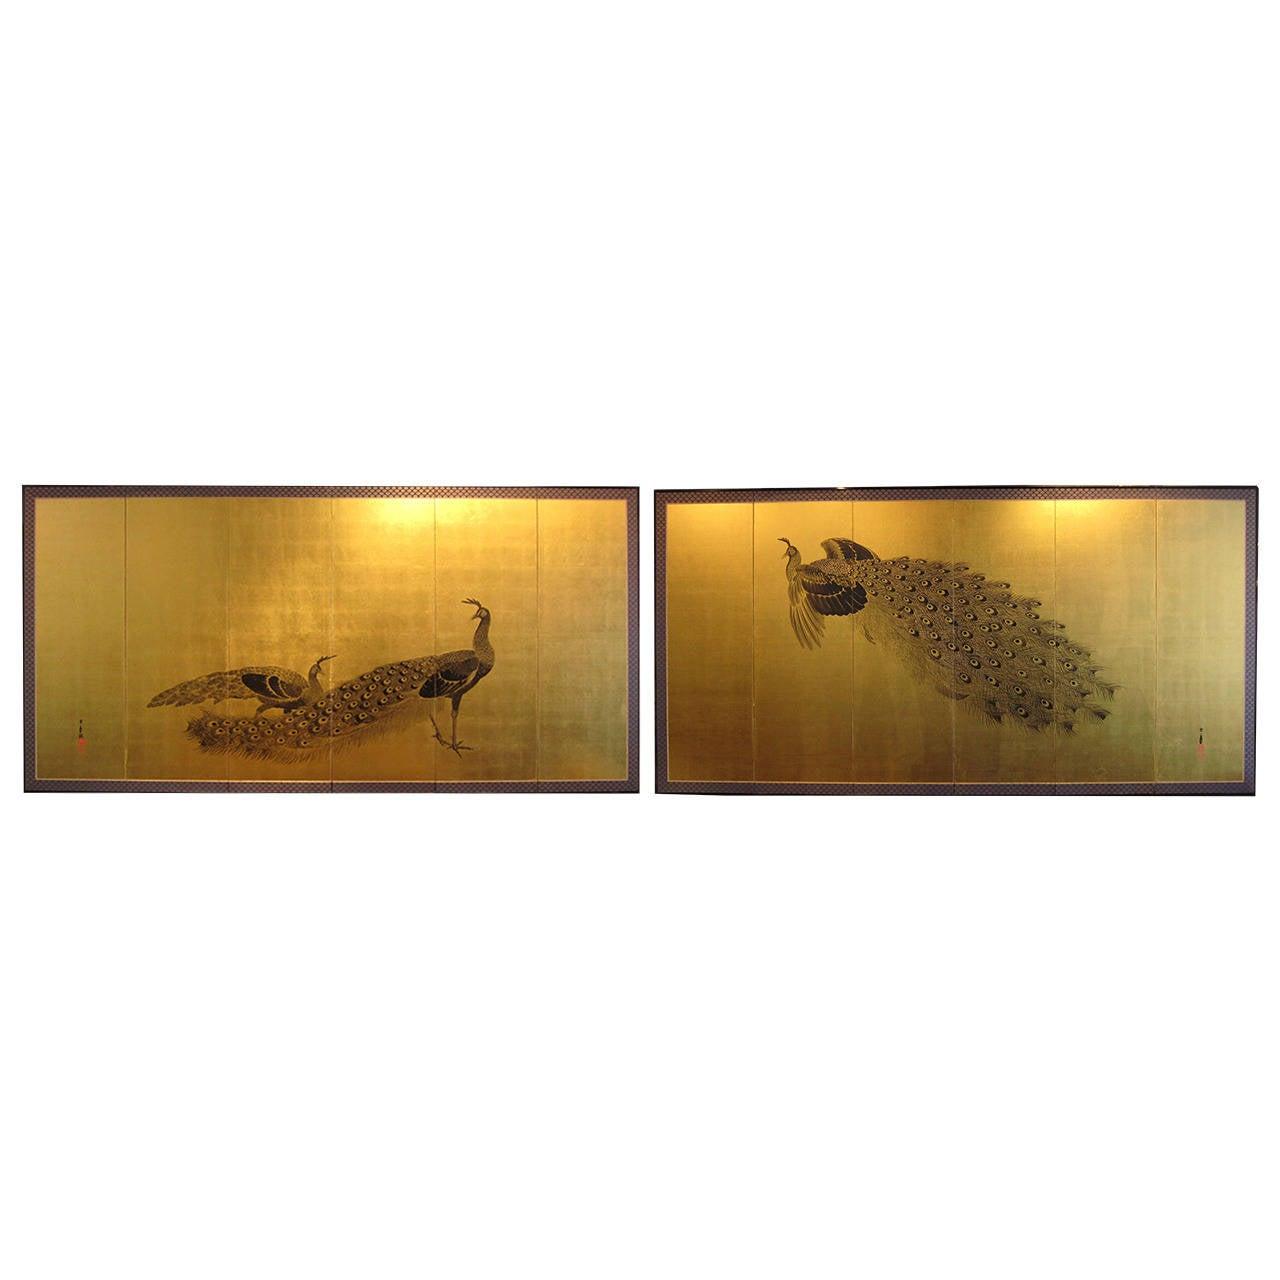 Pair of Japanese Screens by Imao Keinen